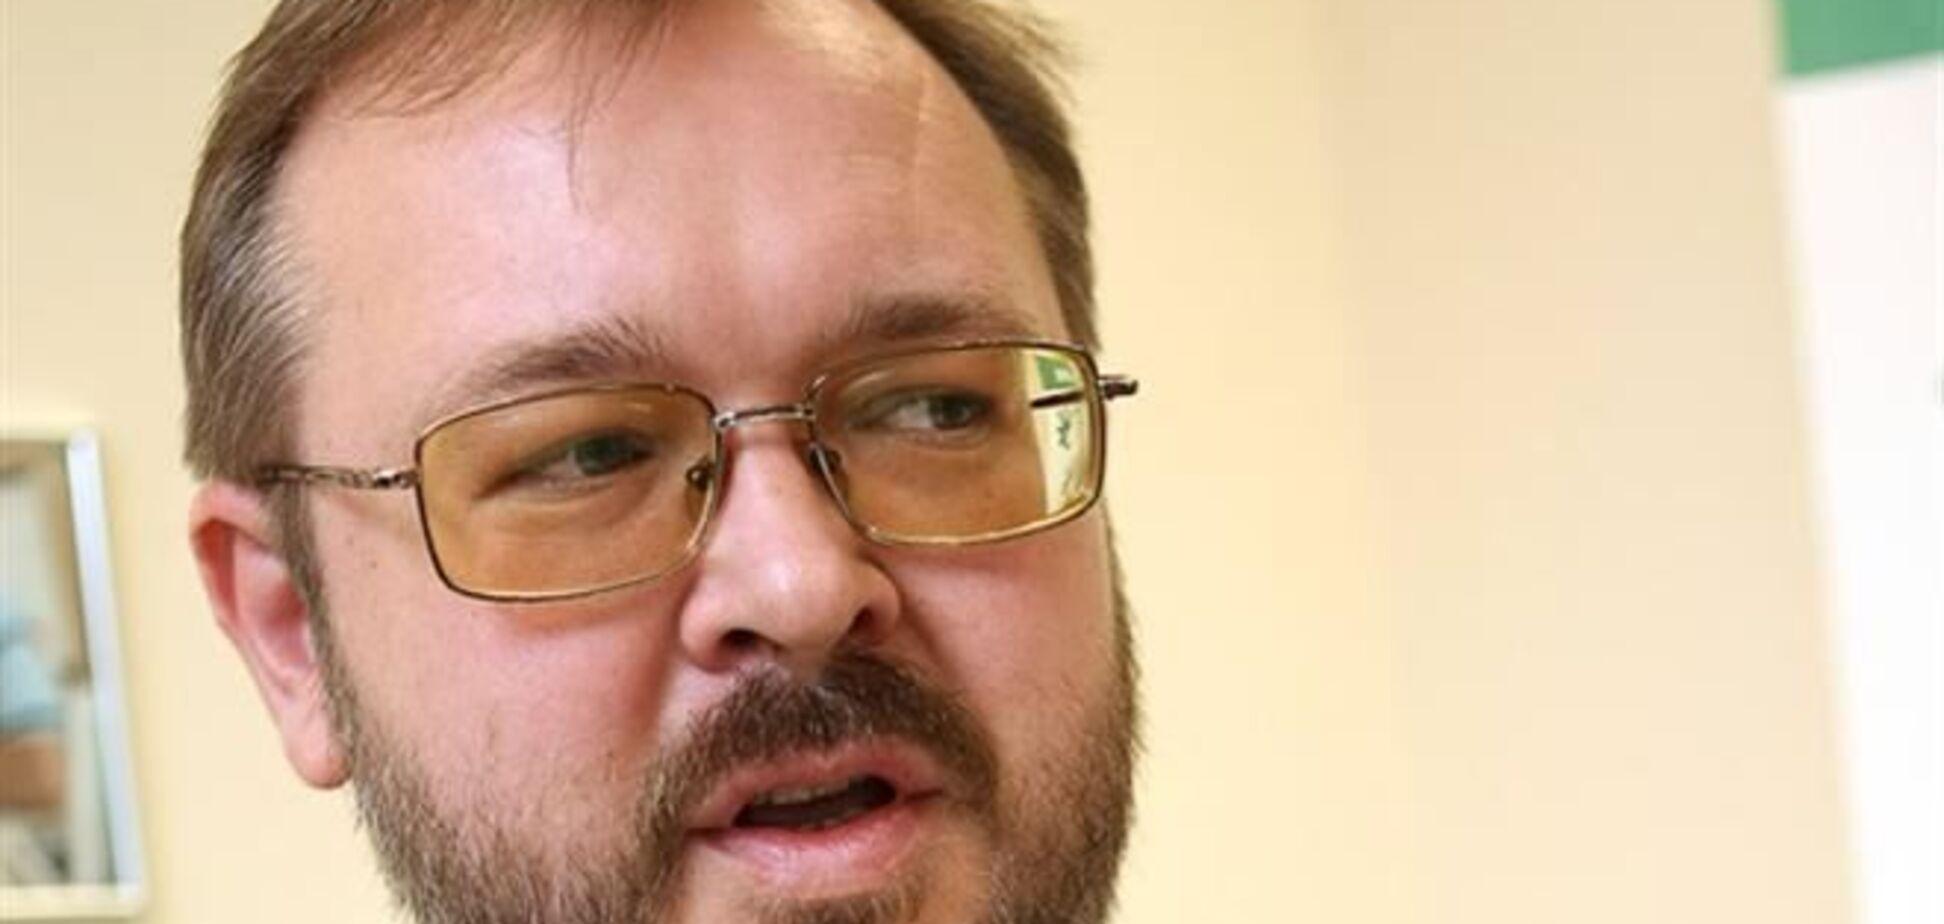 Єрмолаєв: зрадники України вже давно за її межами